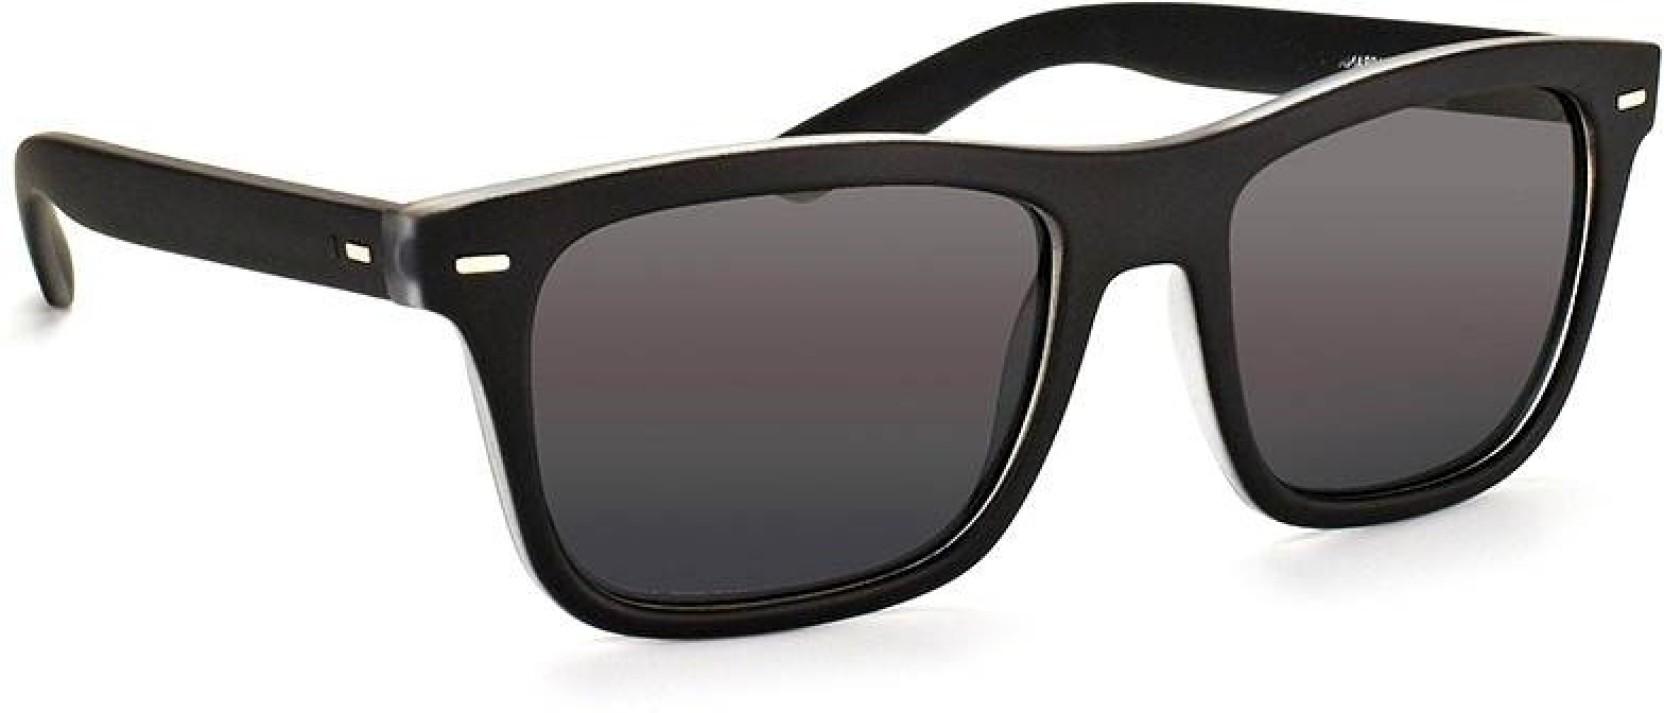 eae9f6b00295 Buy Dolce & Gabbana Wayfarer Sunglasses Silver For Men Online @ Best ...